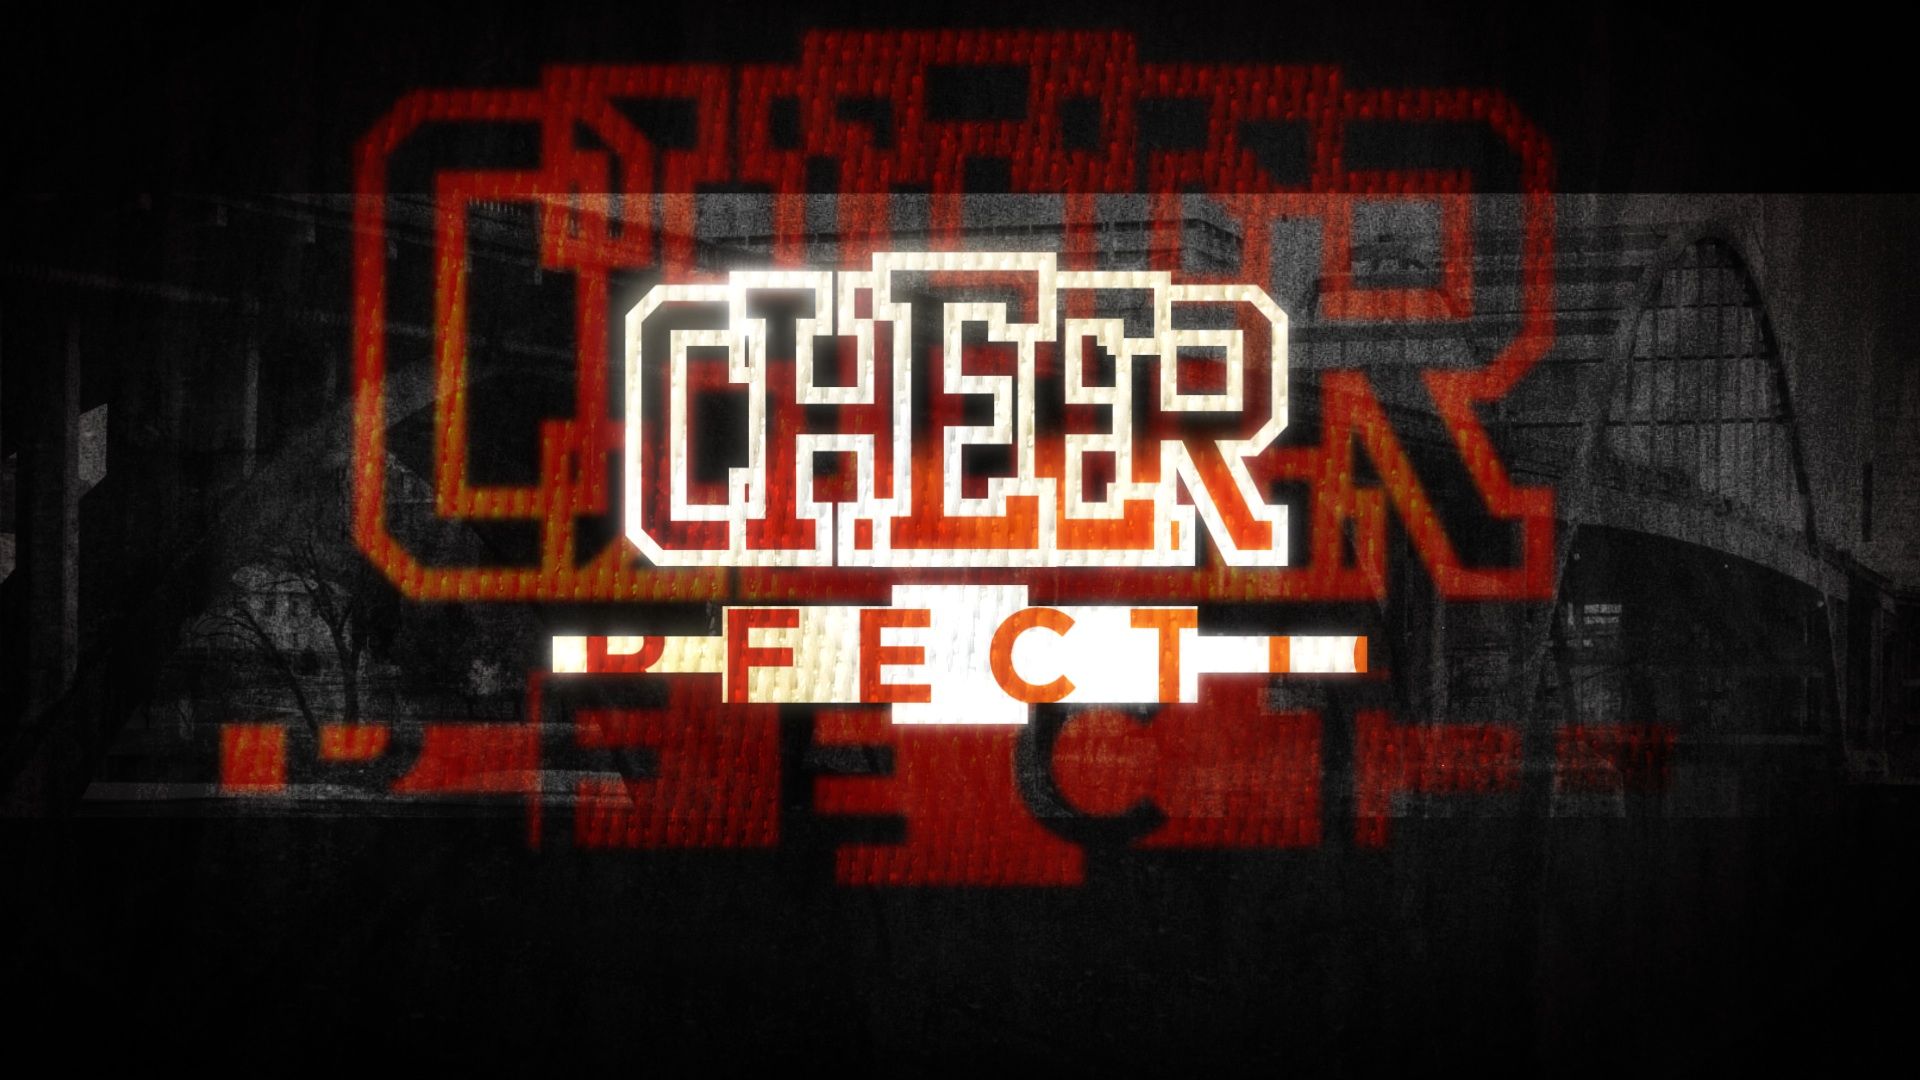 morion graphic design studio jonberrydesign | Cheer Perfection